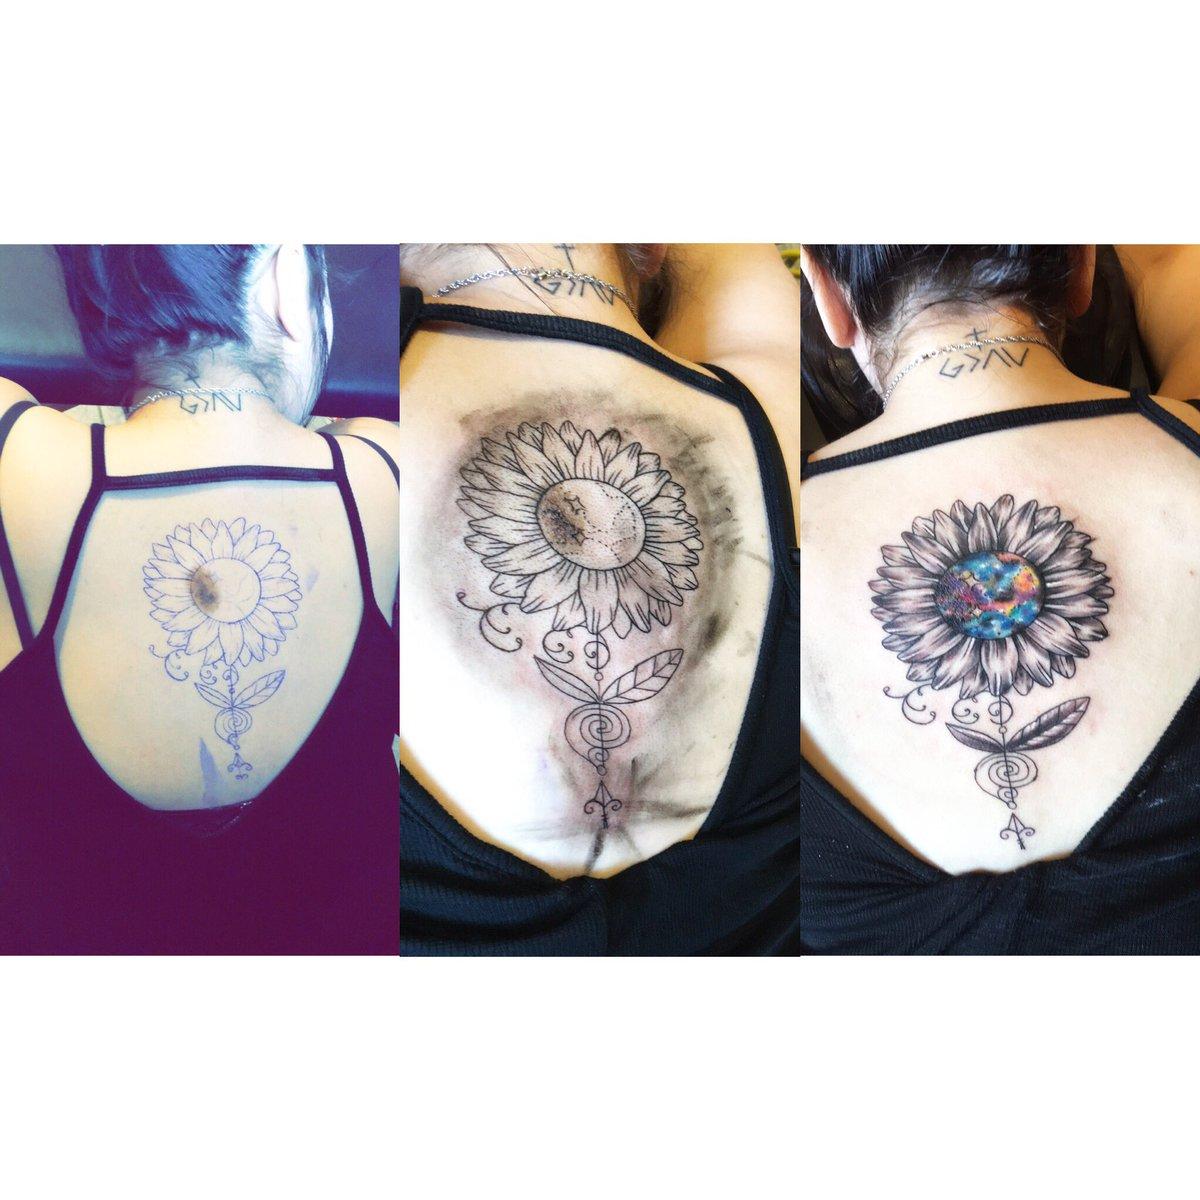 marcas de nacimiento tatuajes (1)